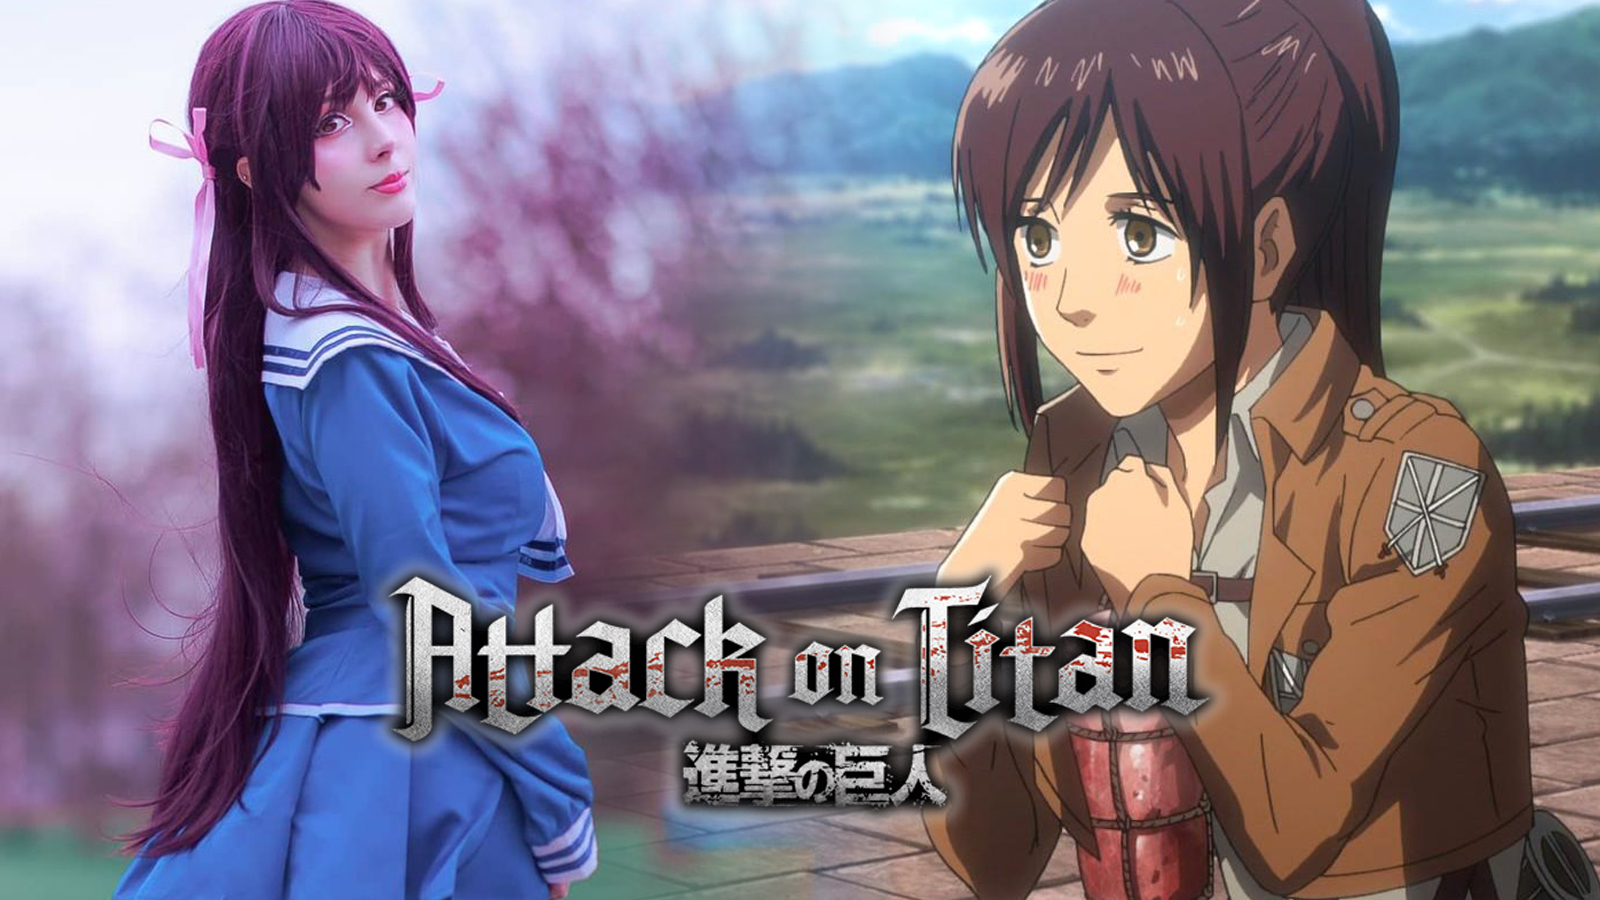 Attack on Titan Sasha Blouse cosplay